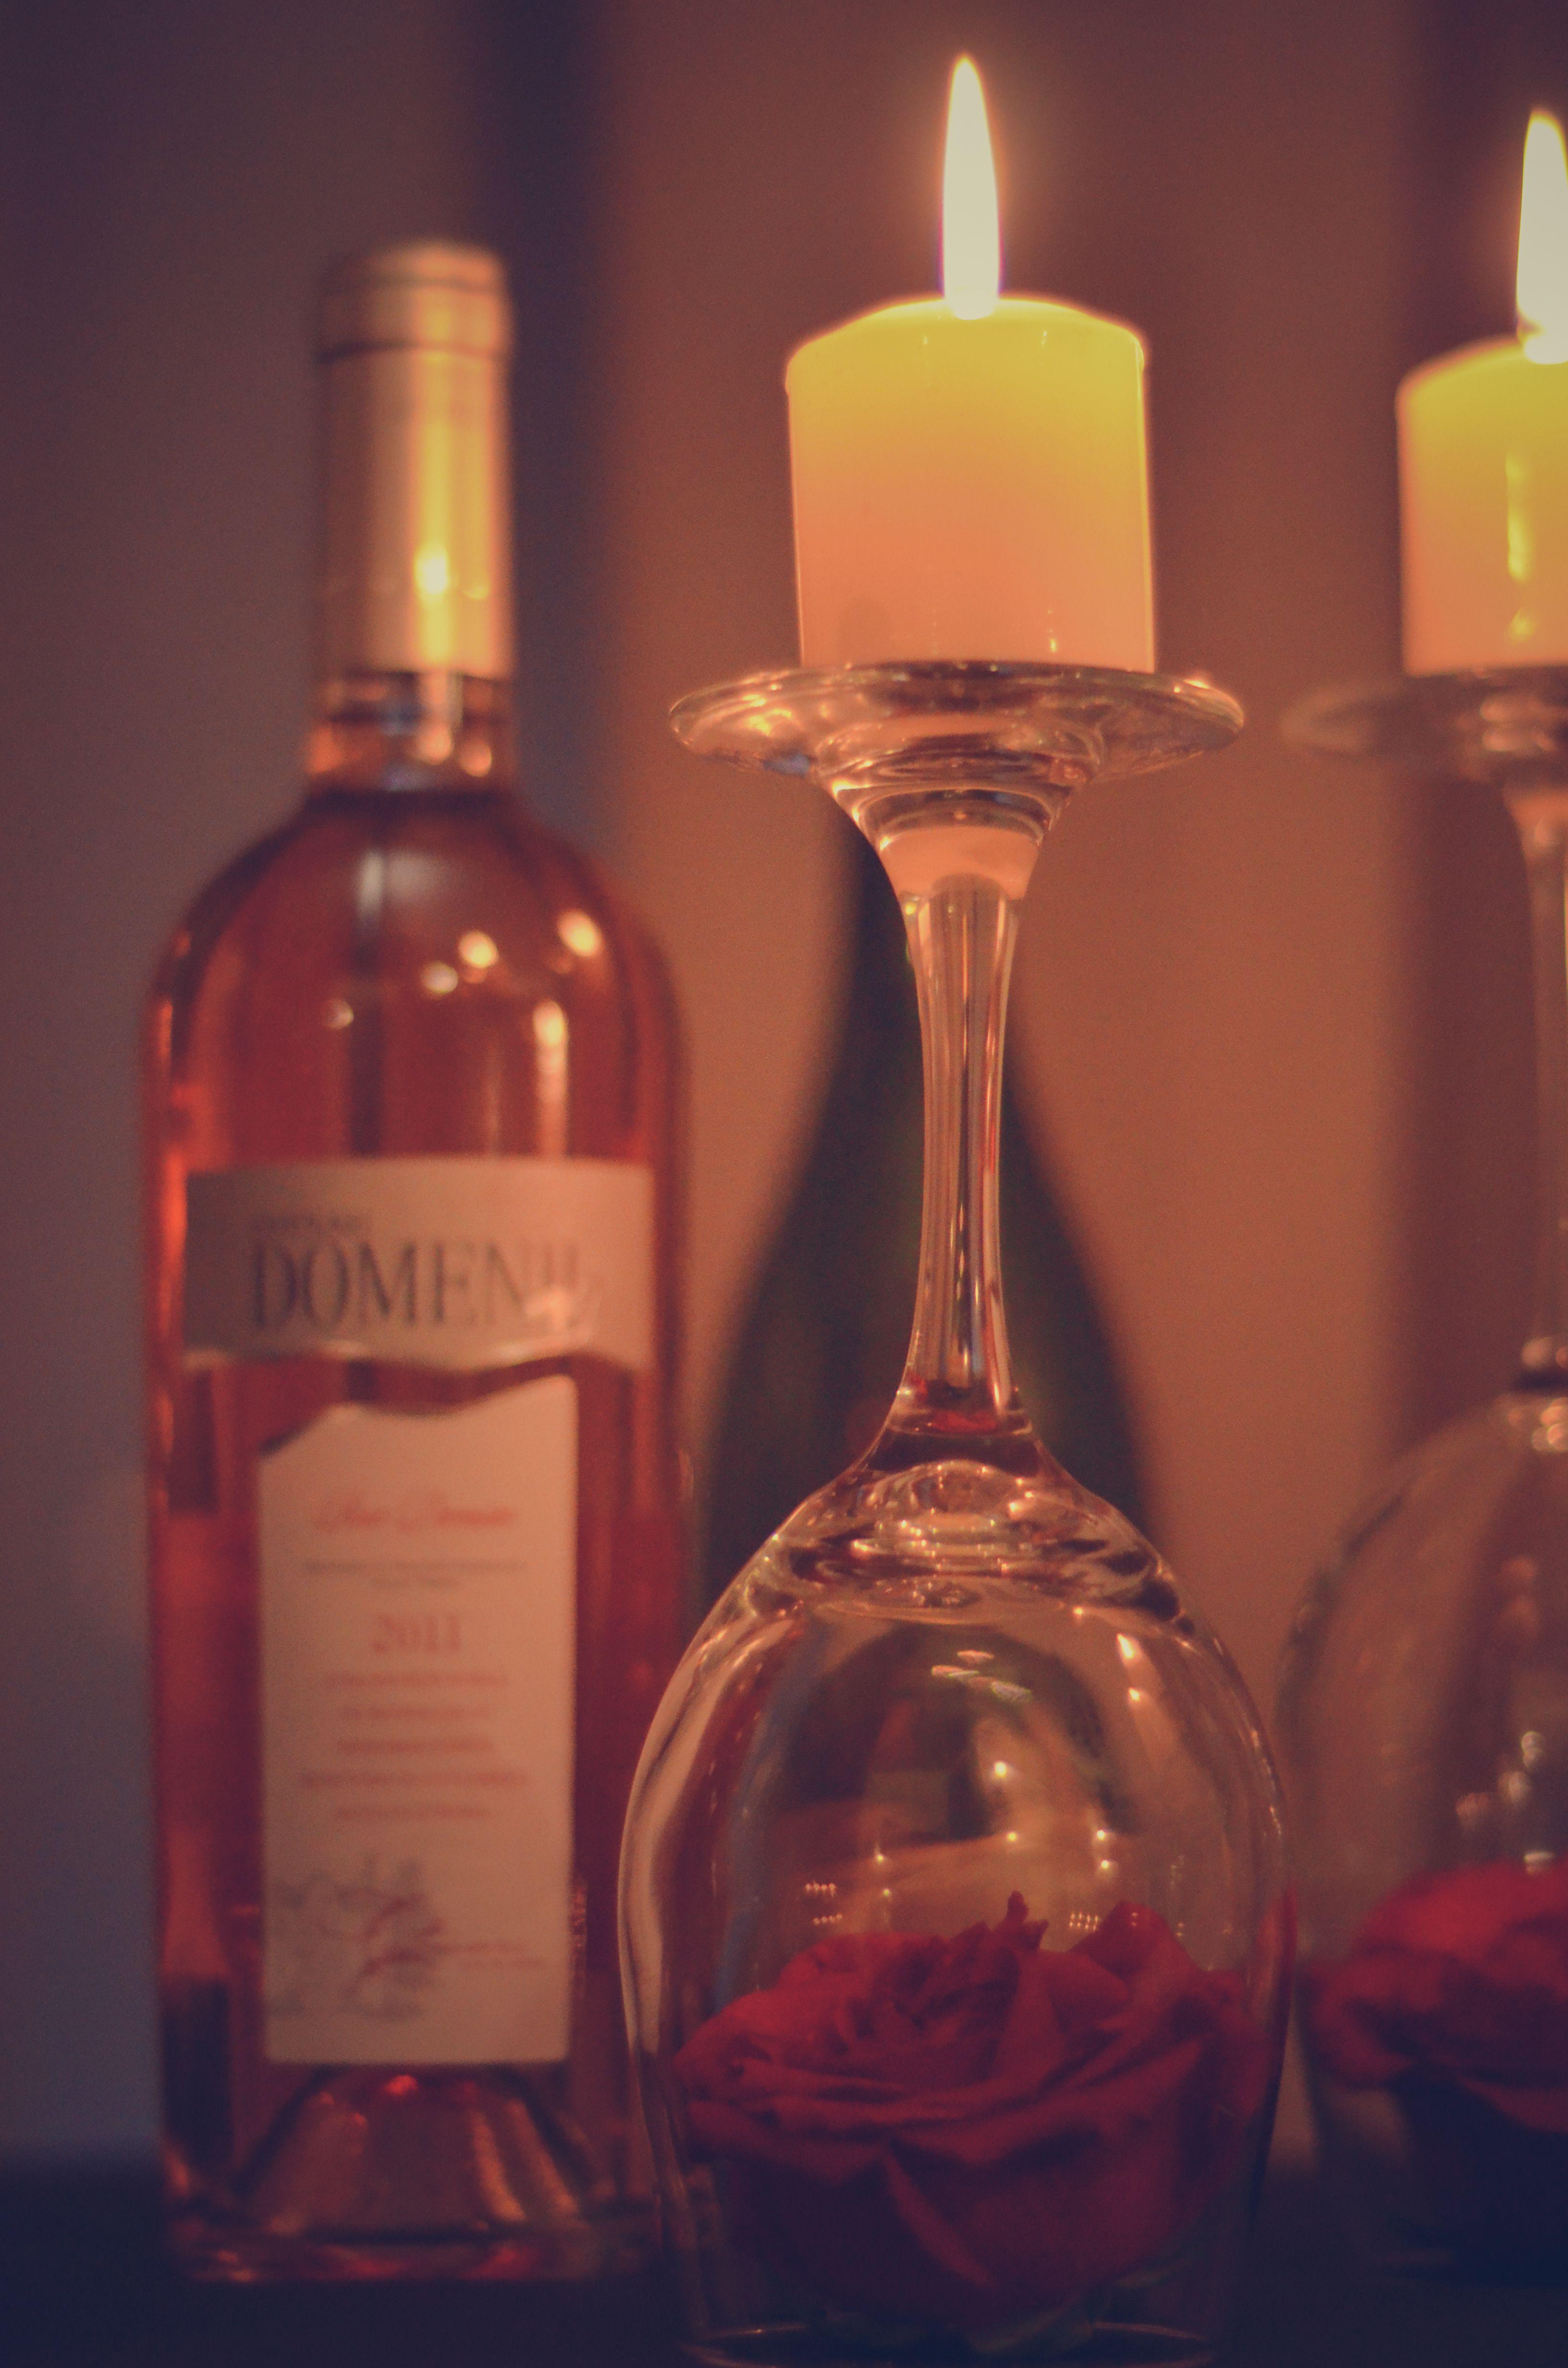 Cotnari Wine House Busuioaca De Bohotin Domenii Wine Bottle Rose Wine Bottle Rose Wine